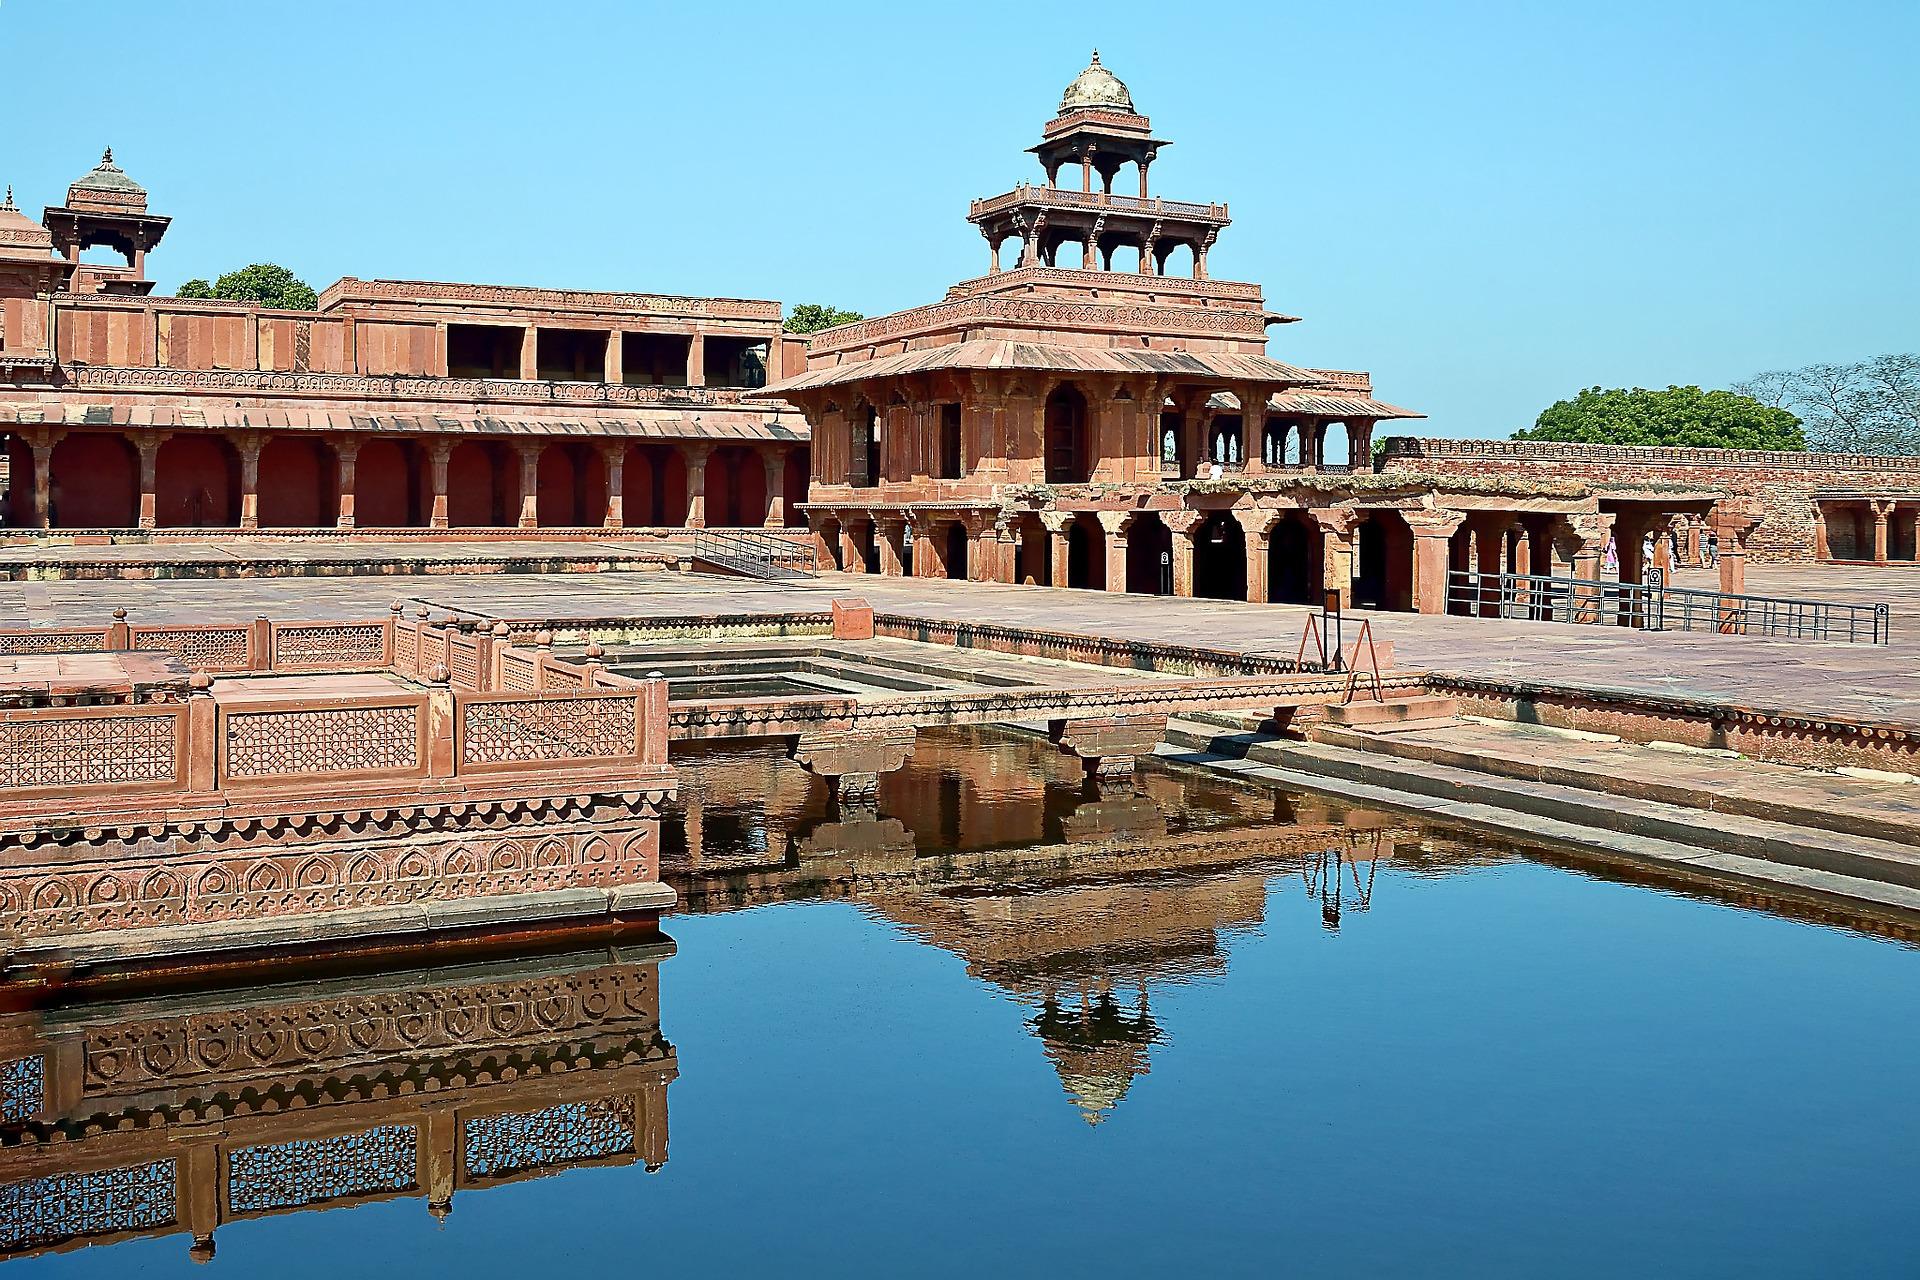 India's Golden Triangle & Tiger Safari - Fatehpur Sikri Fort, India